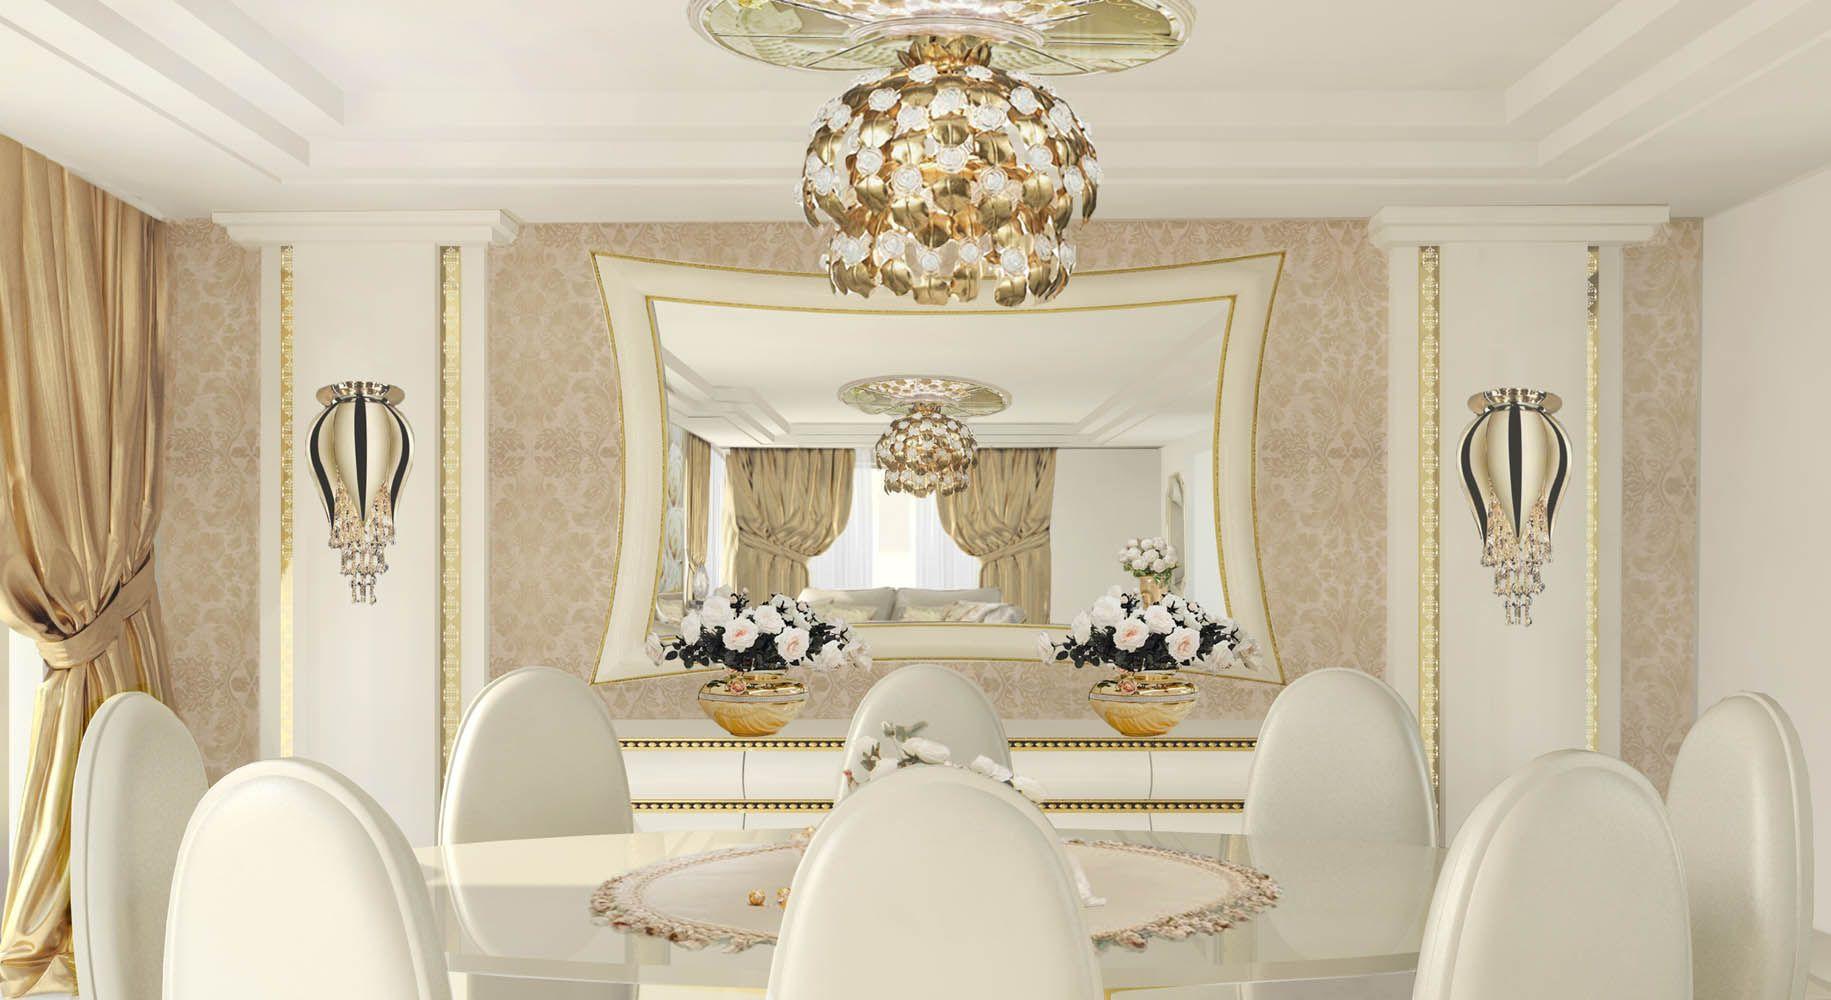 Lidia Bersani Luxury Interior Design white and golden mirror